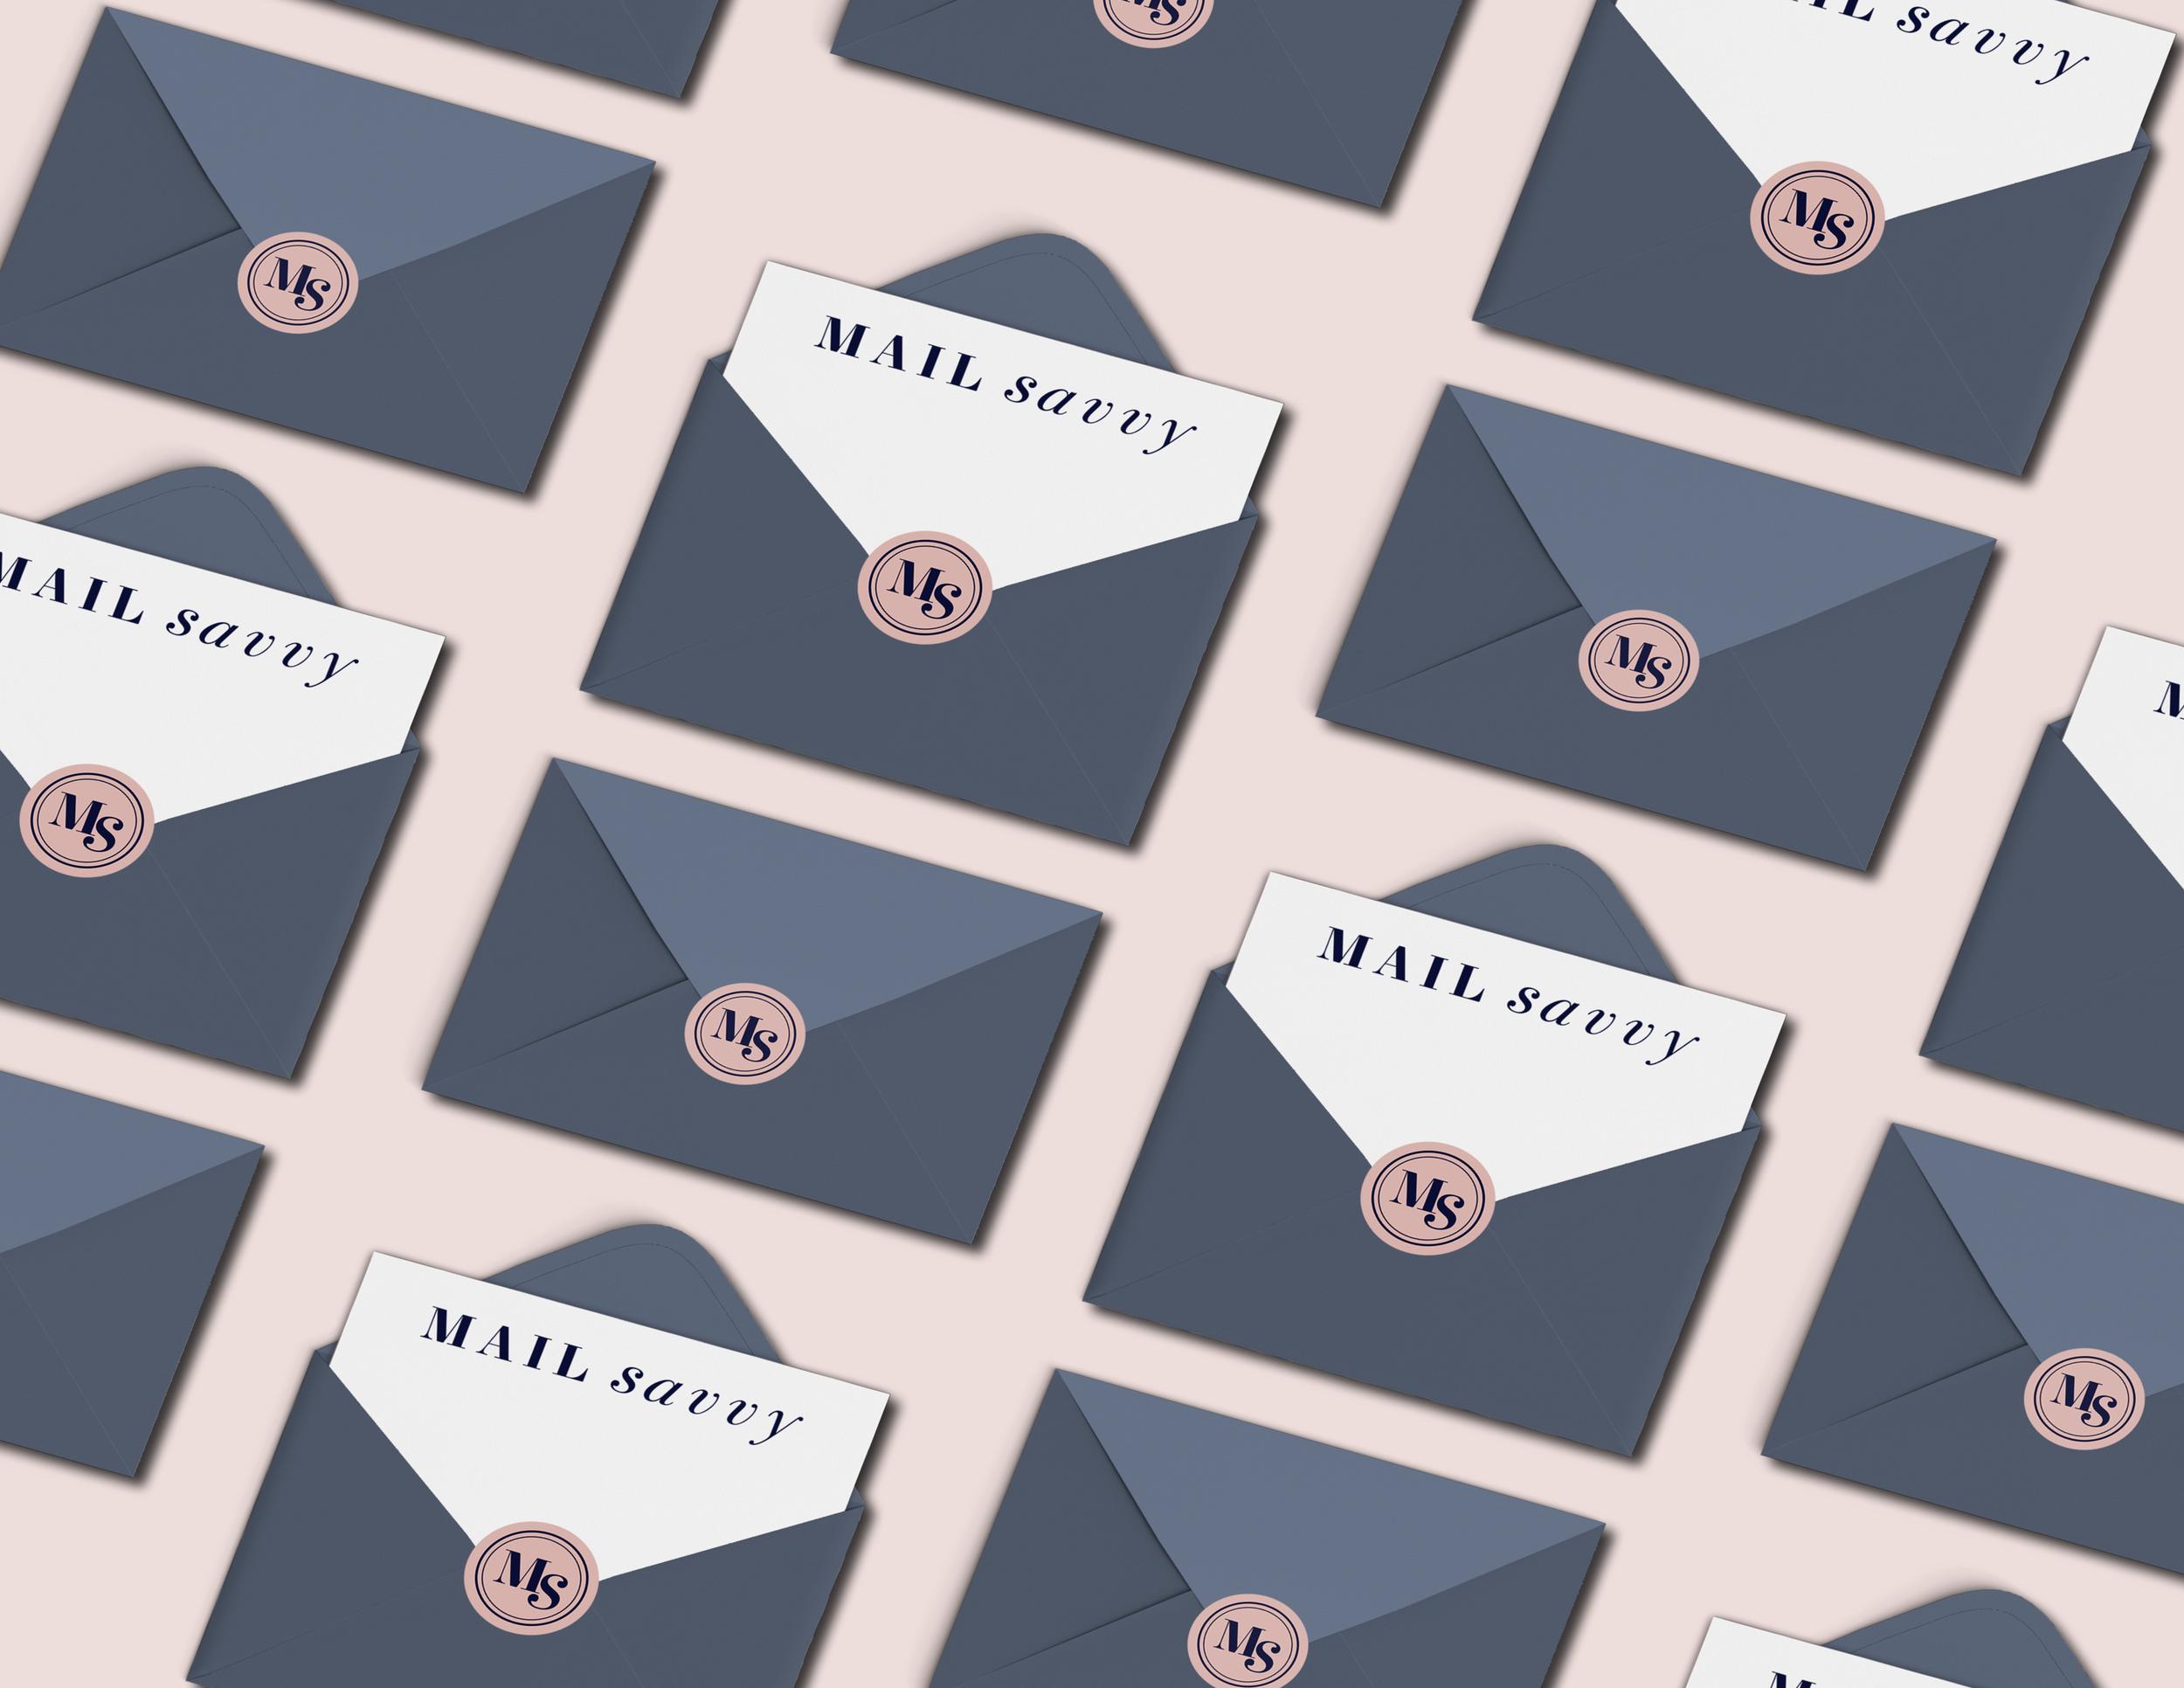 Mail Savvy Mockup - Kira Hyde Creative